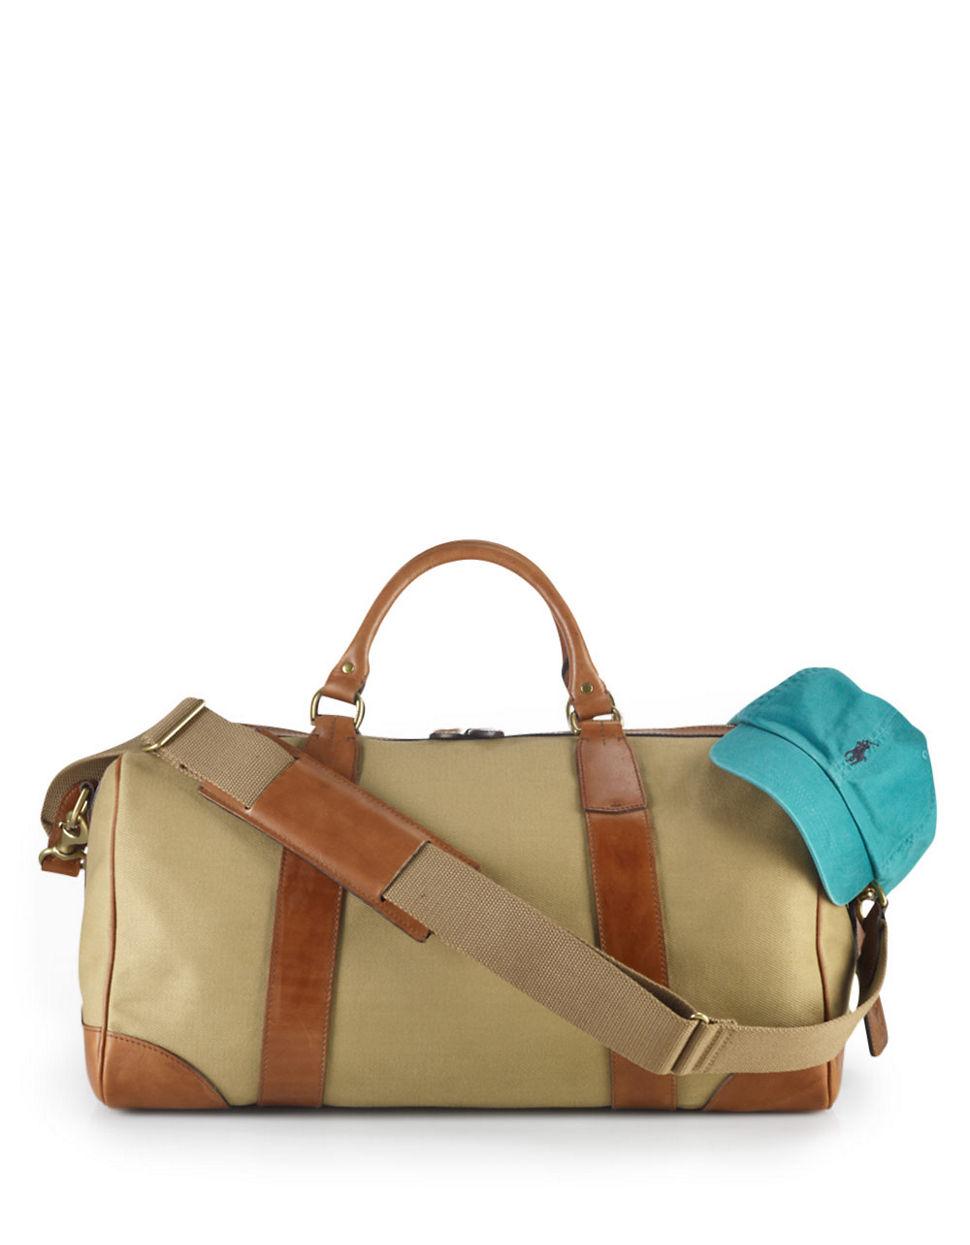 26fe89125c Polo Ralph Lauren Mens Holdall Sports Gym Weekend Bag Blue